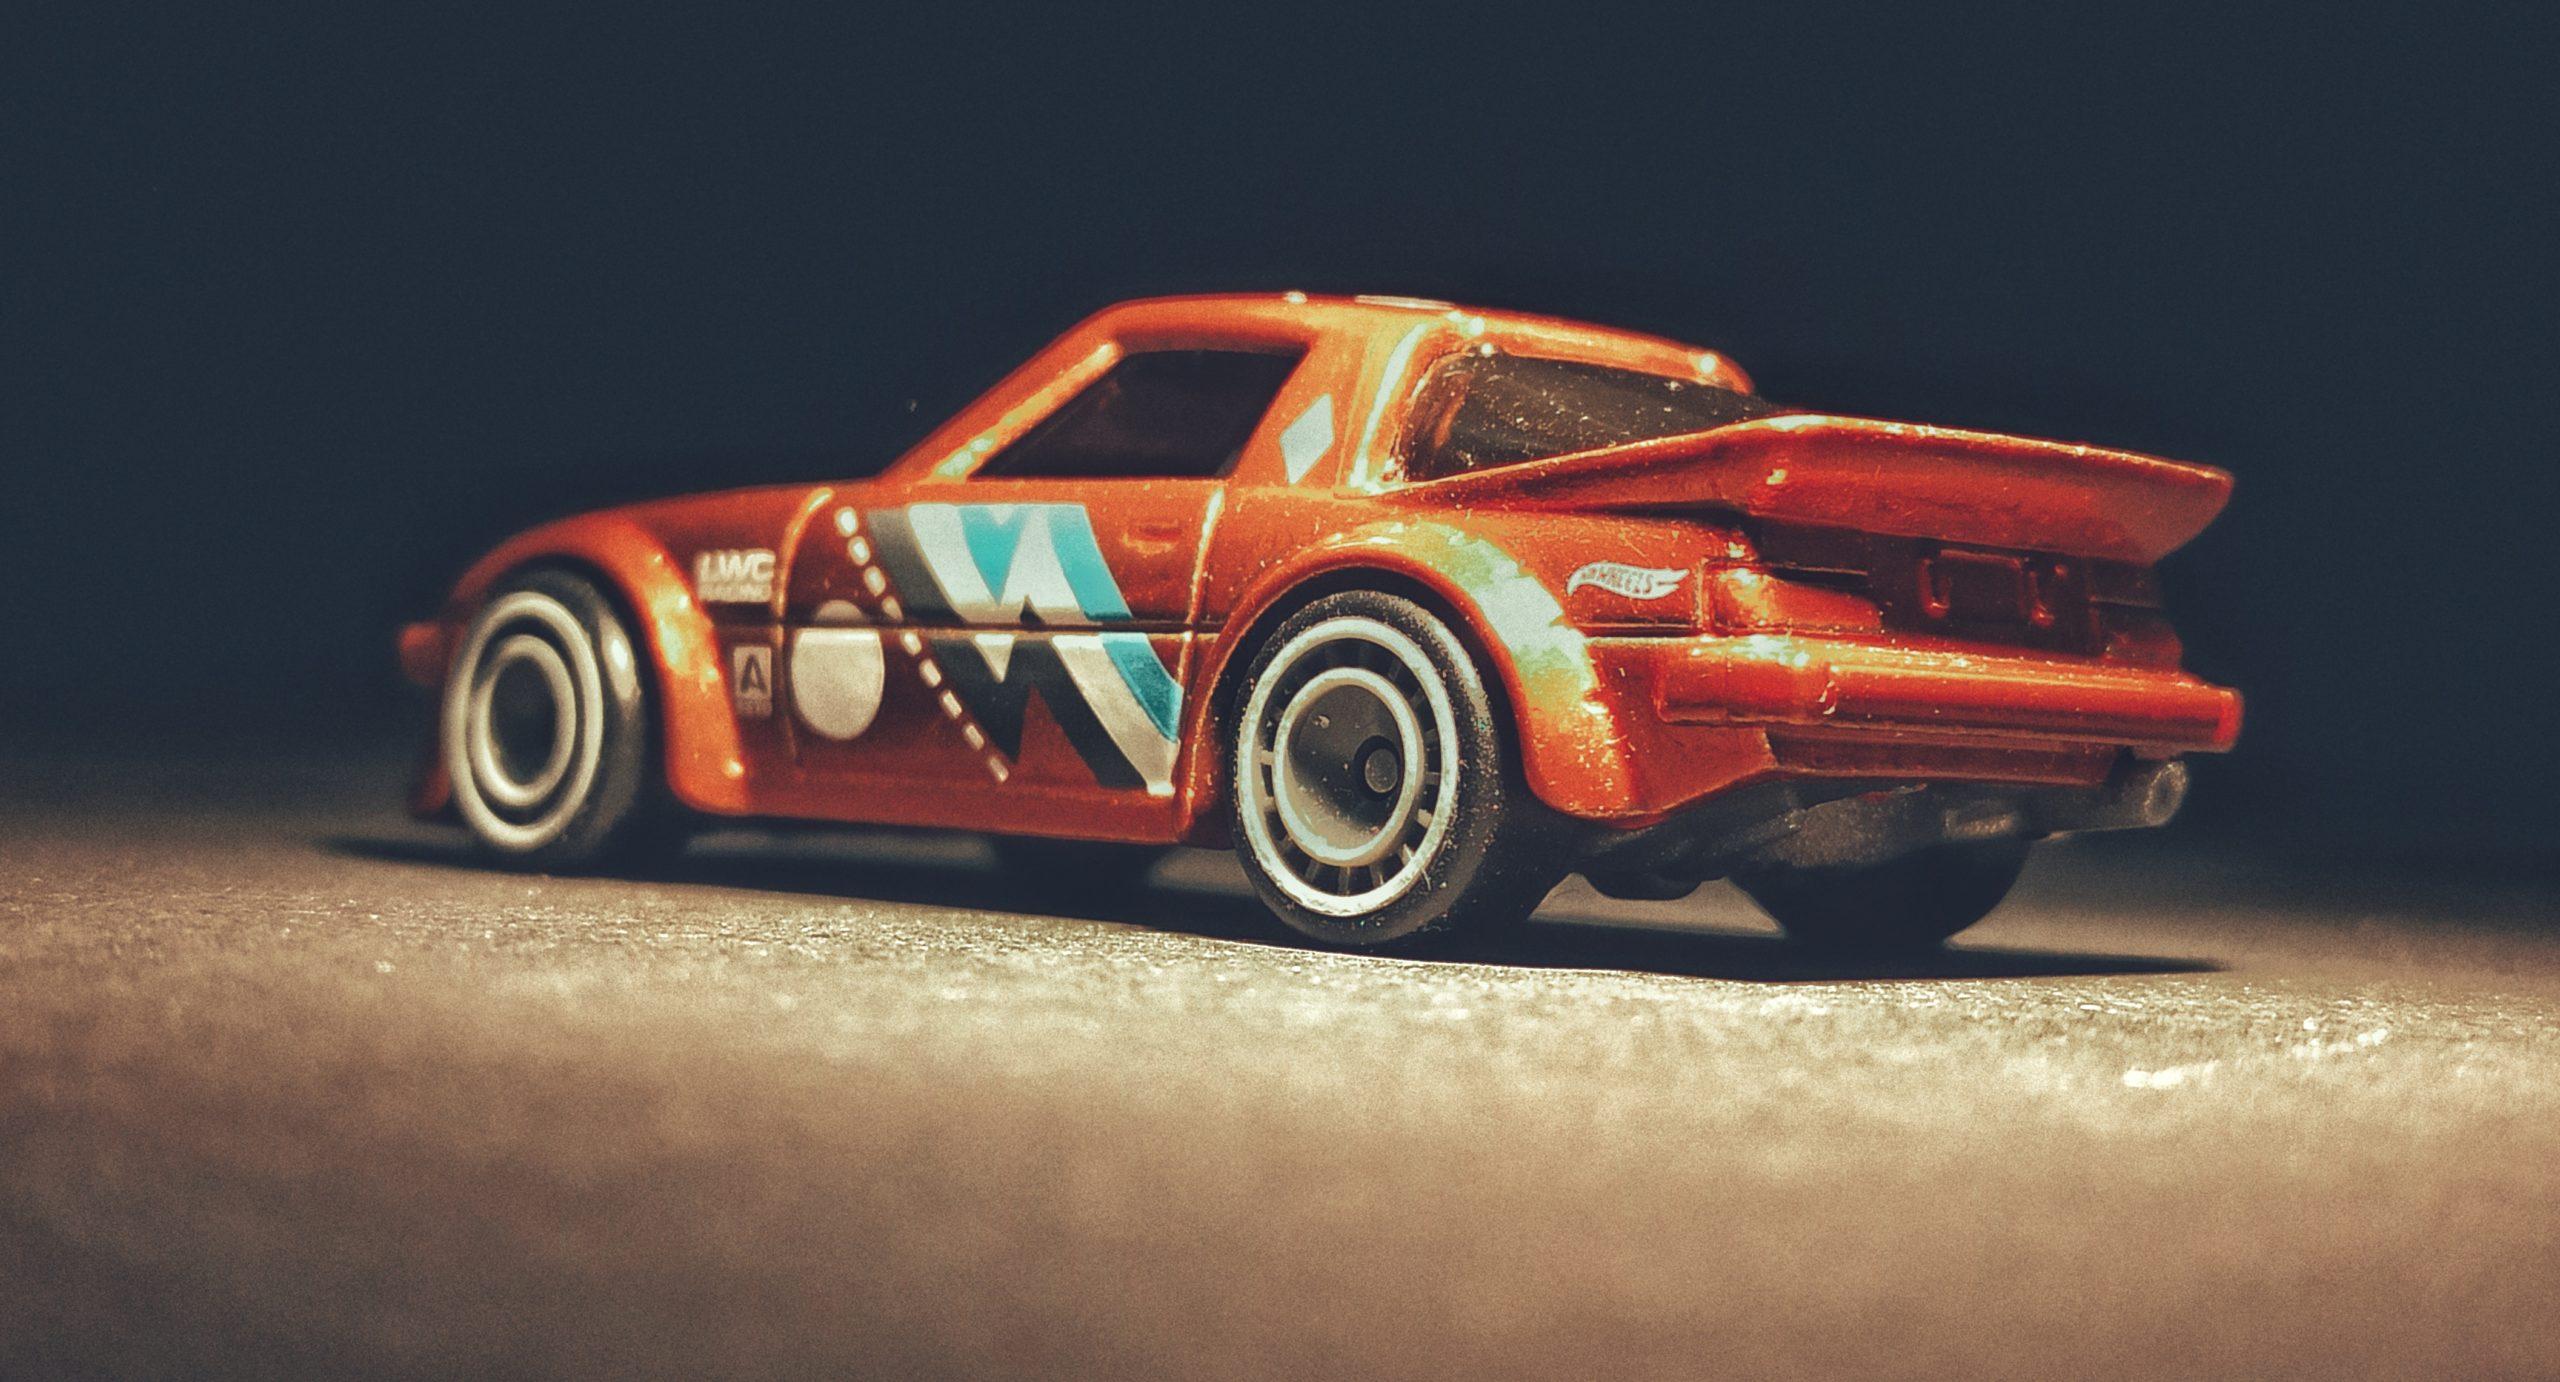 Hot Wheels Mazda RX-7 (GHG28) 2020 (130/250) Speed Blur (5/5) spectraflame orange Super Treasure Hunt (STH) side angle